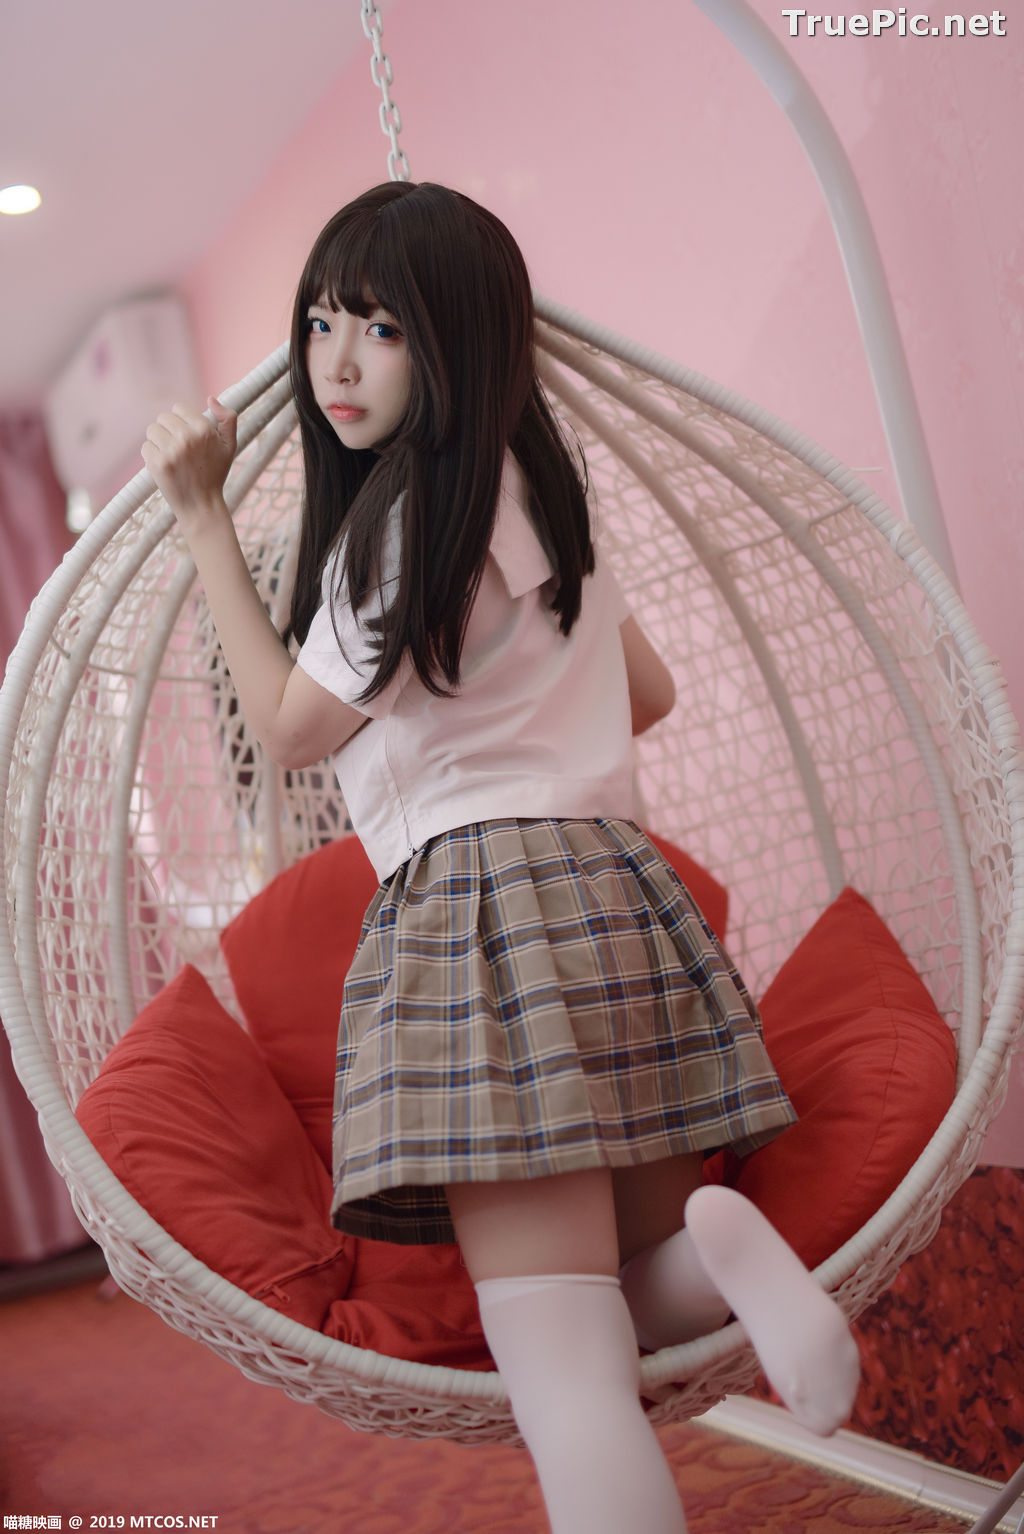 Image [MTCos] 喵糖映画 Vol.034 – Chinese Cute Model - Schoolgirl Uniform - TruePic.net - Picture-1